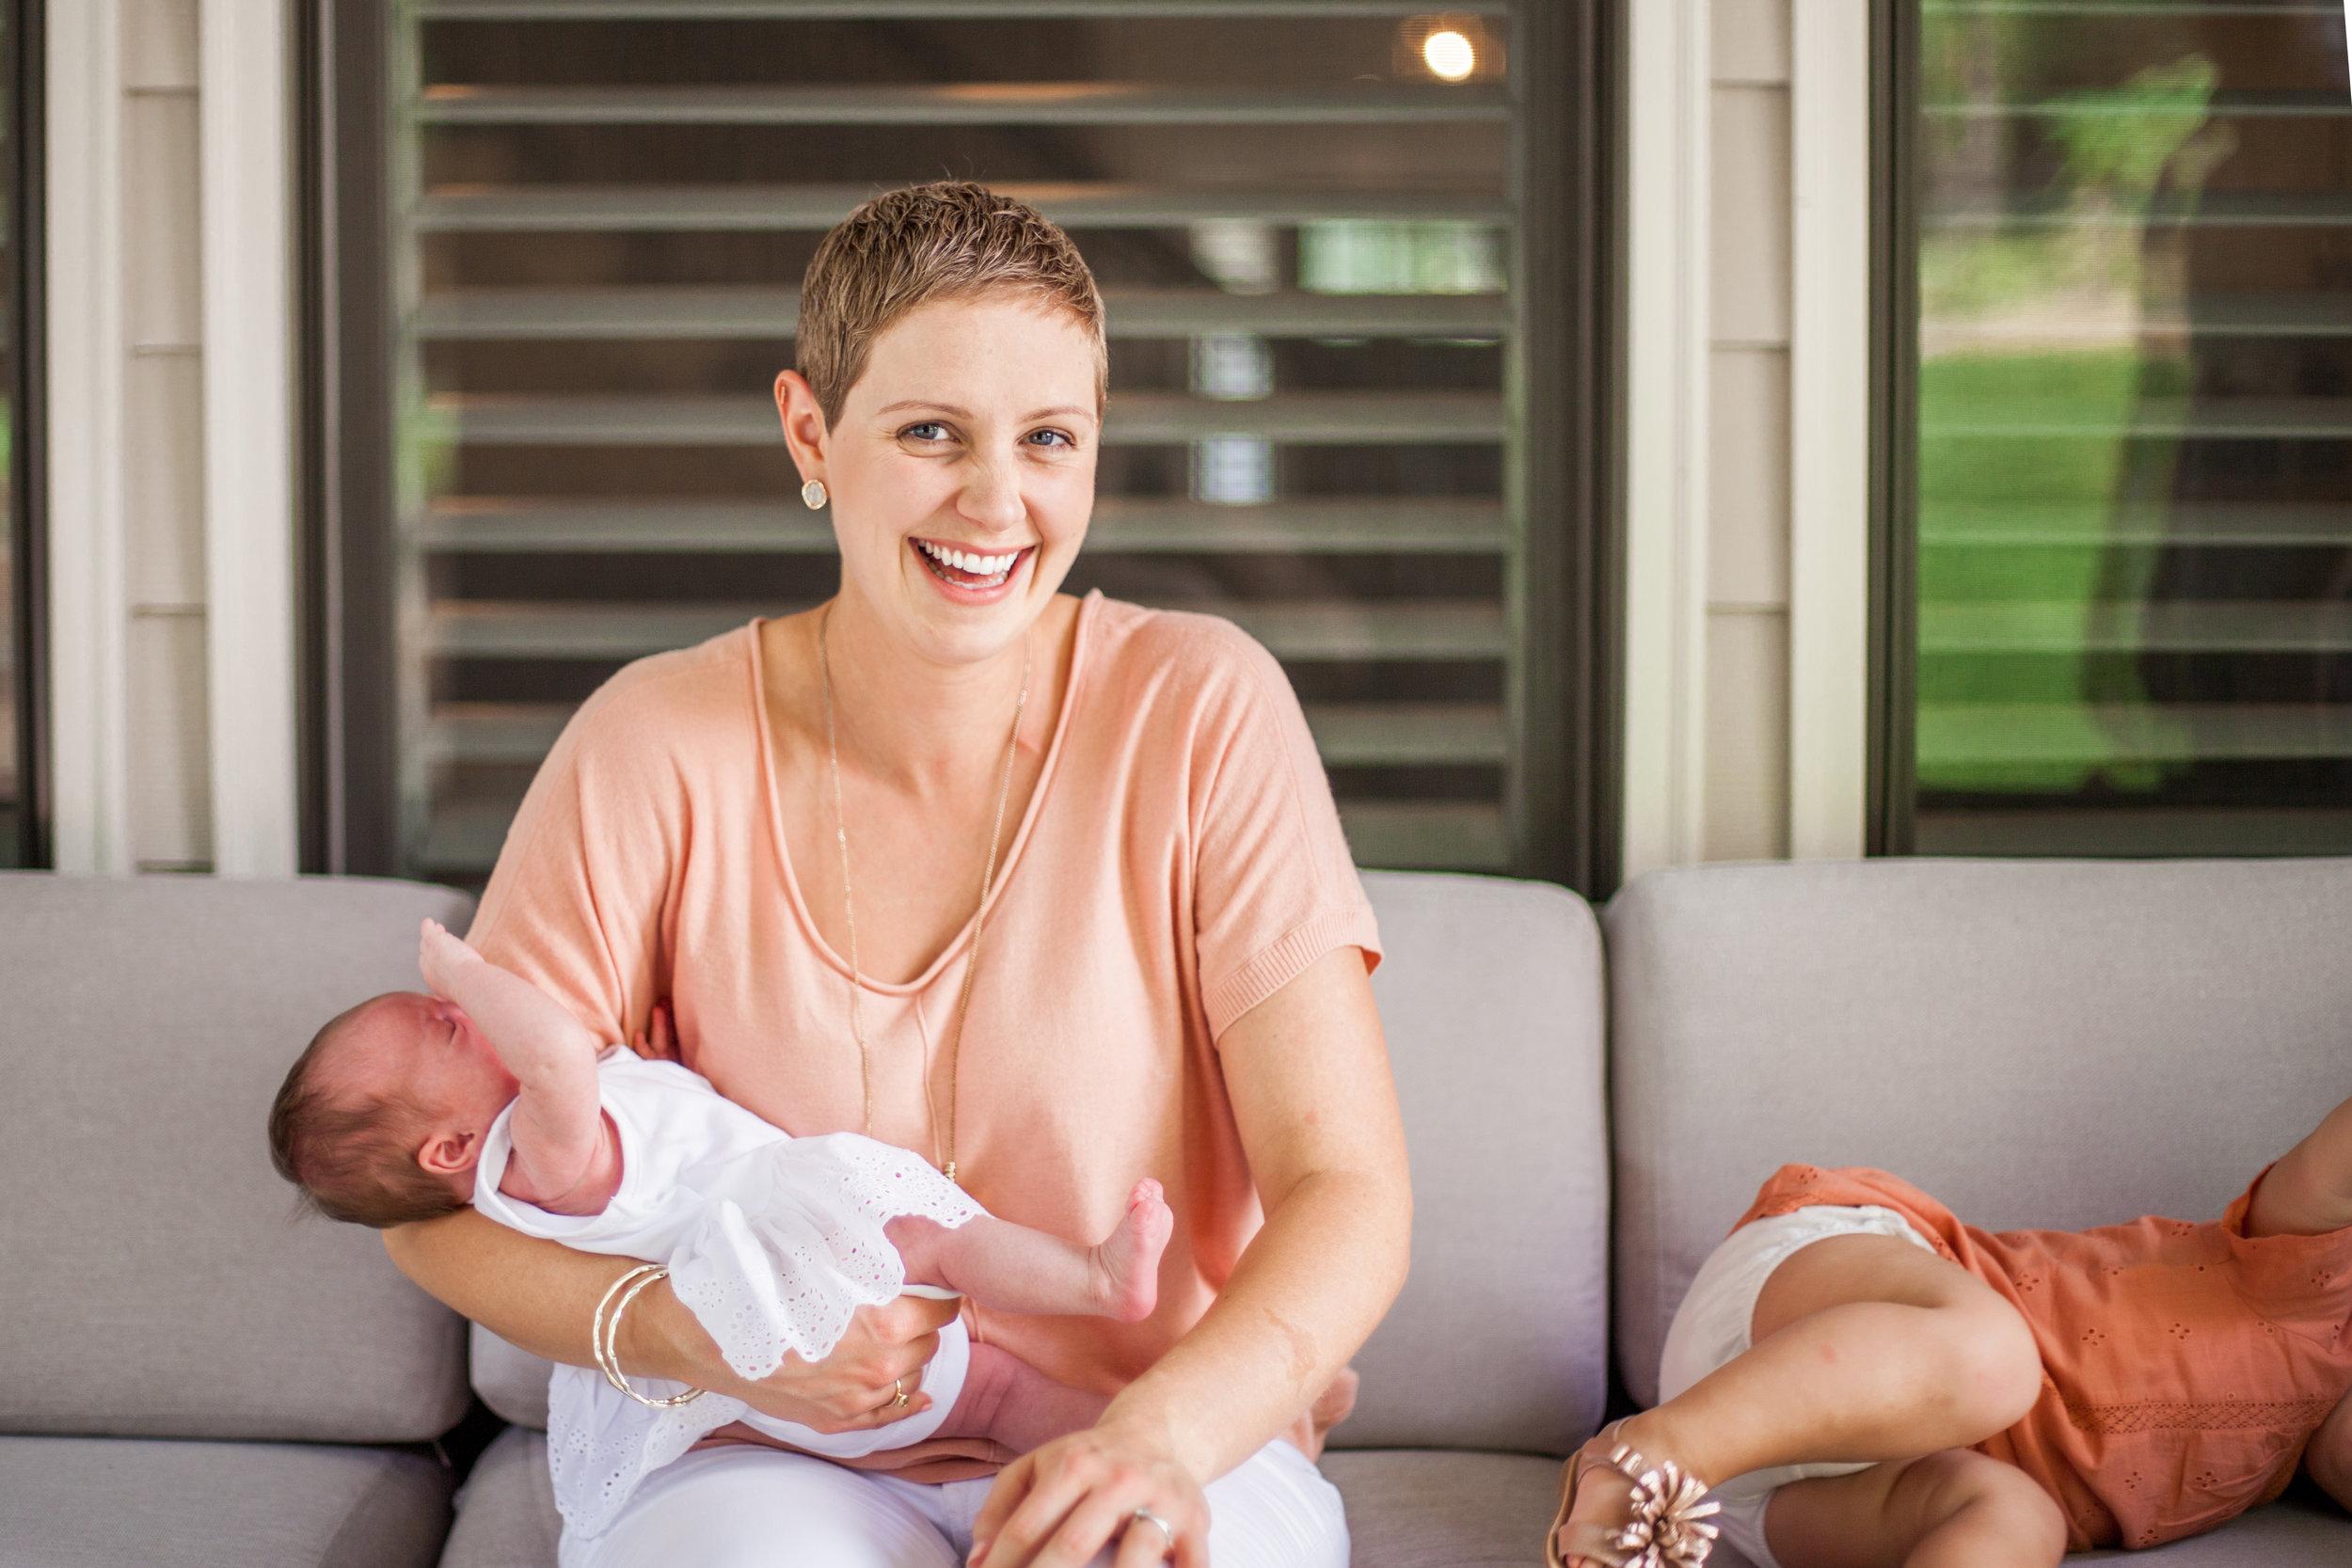 brookhaven-newborn-lifestyle-photography-with-sibling-angela-elliott-wingard-51.jpg